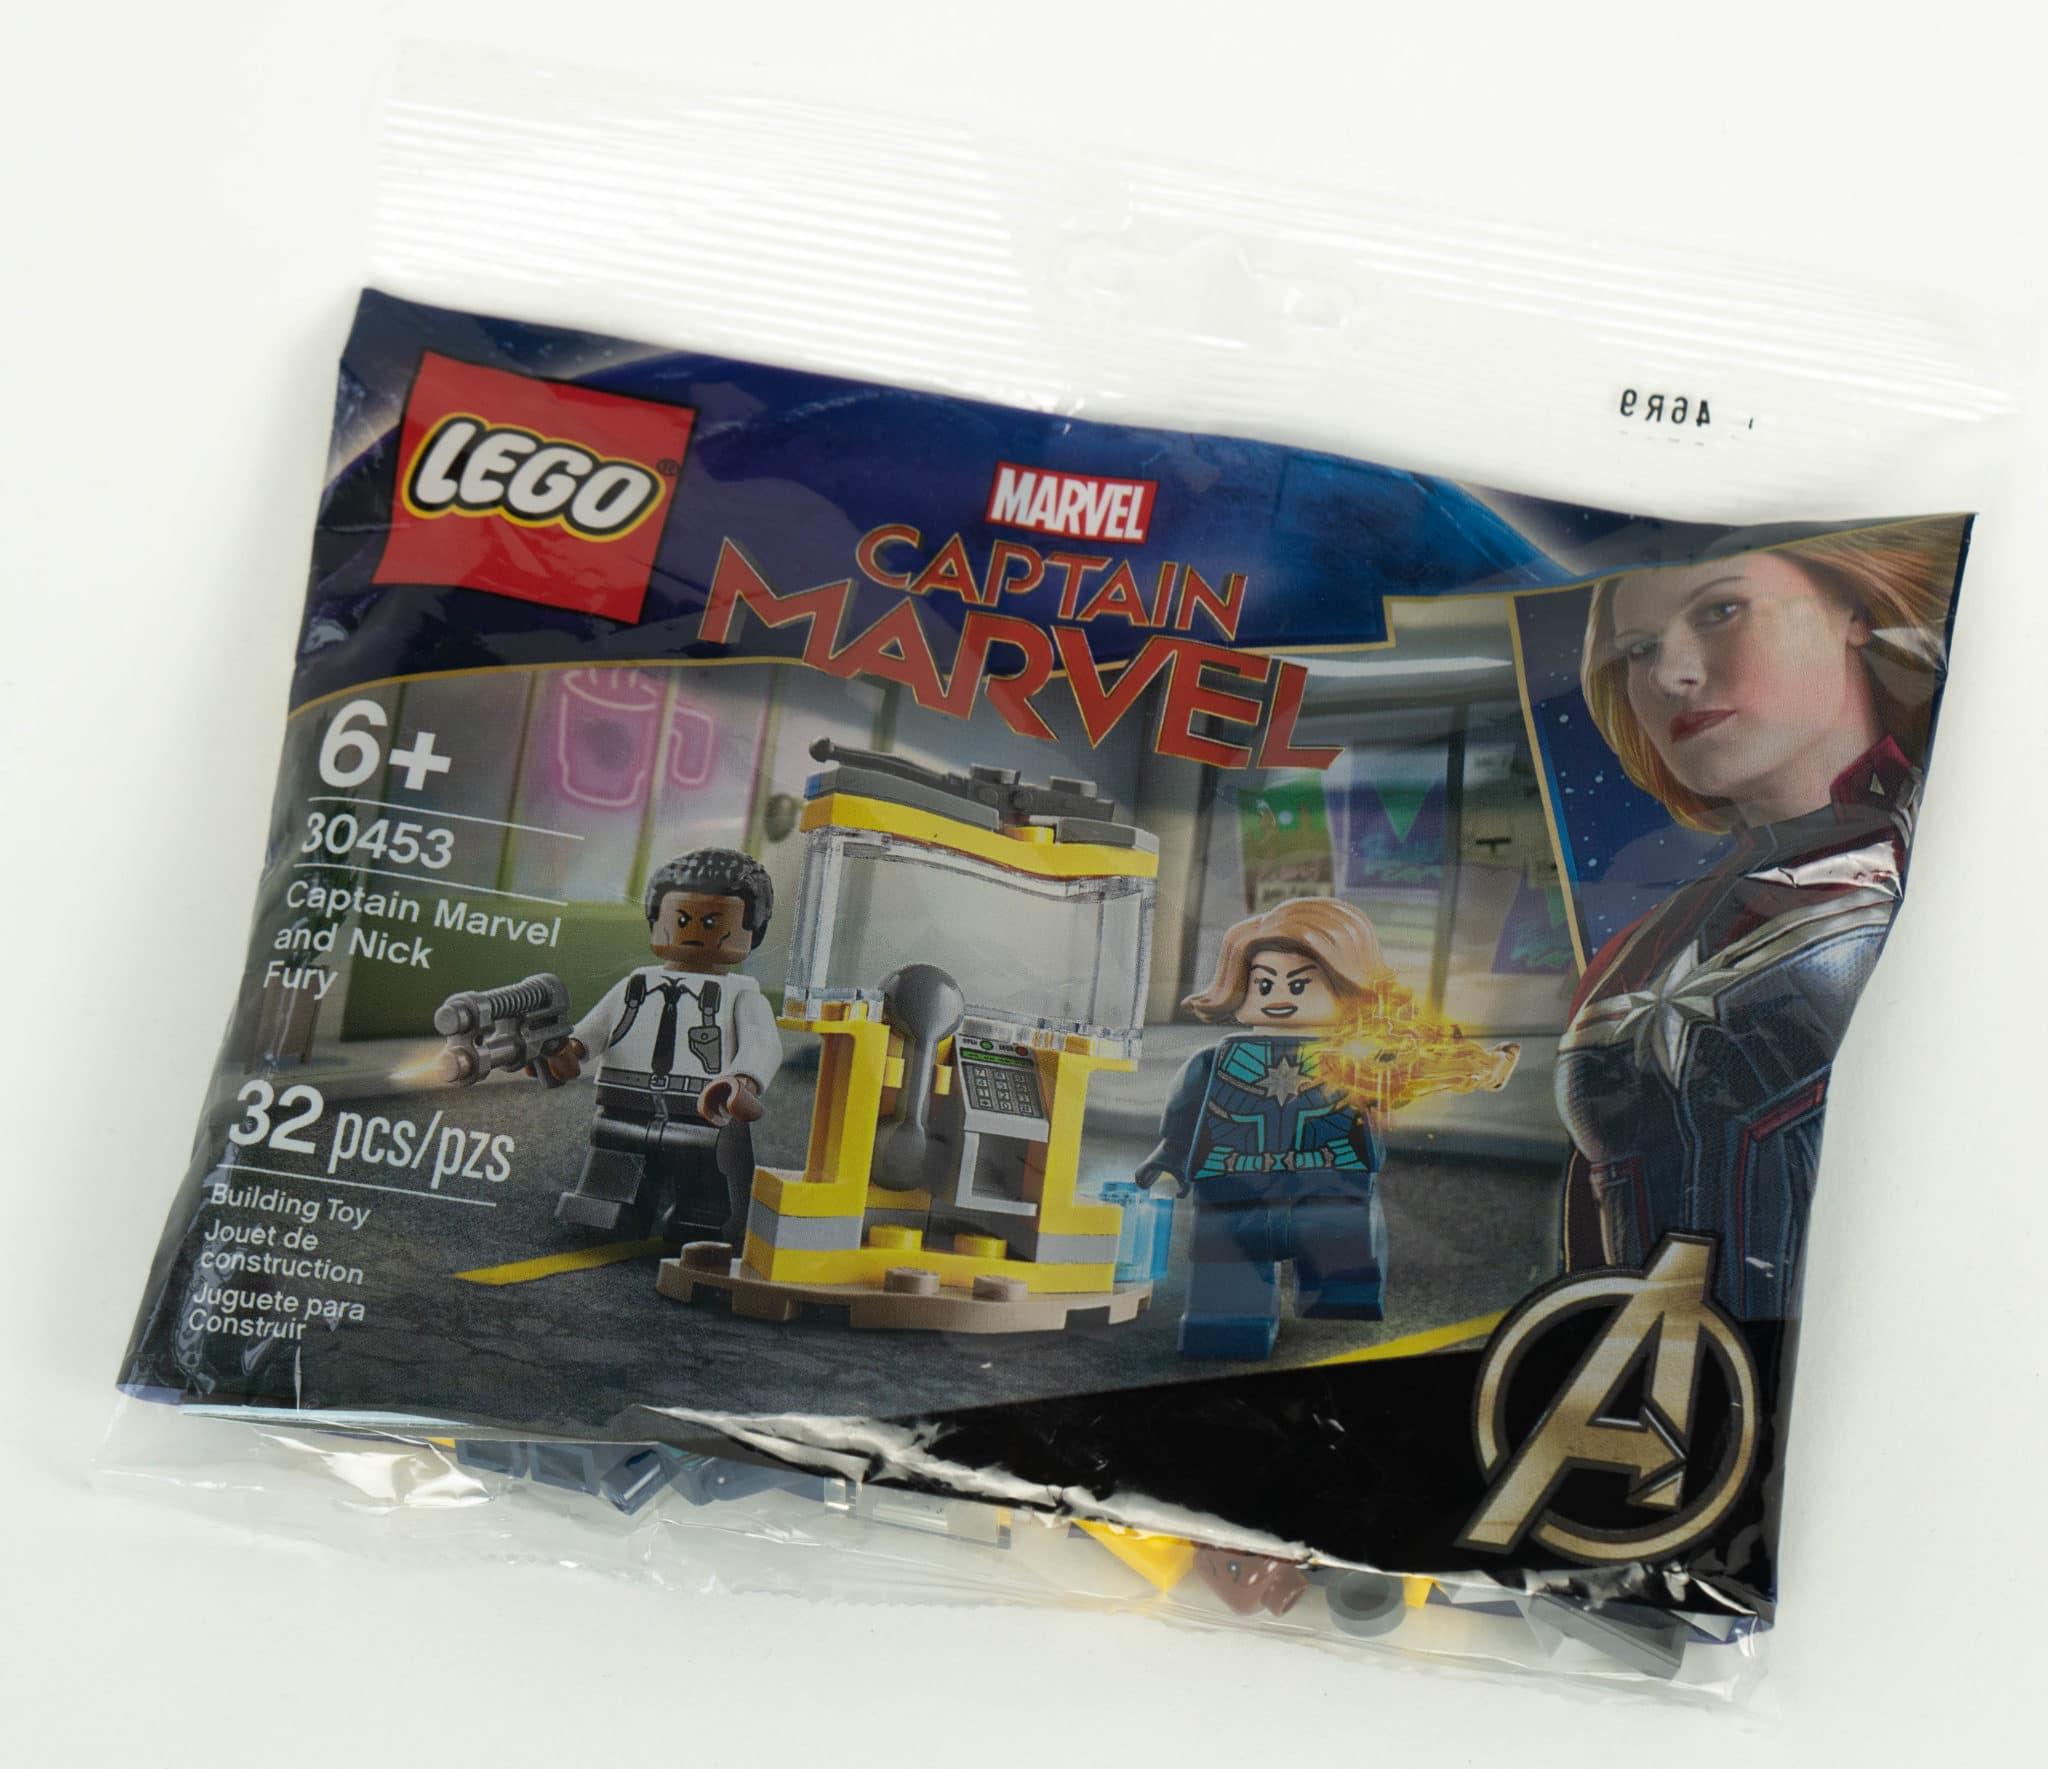 LEGO 30453 Polybag